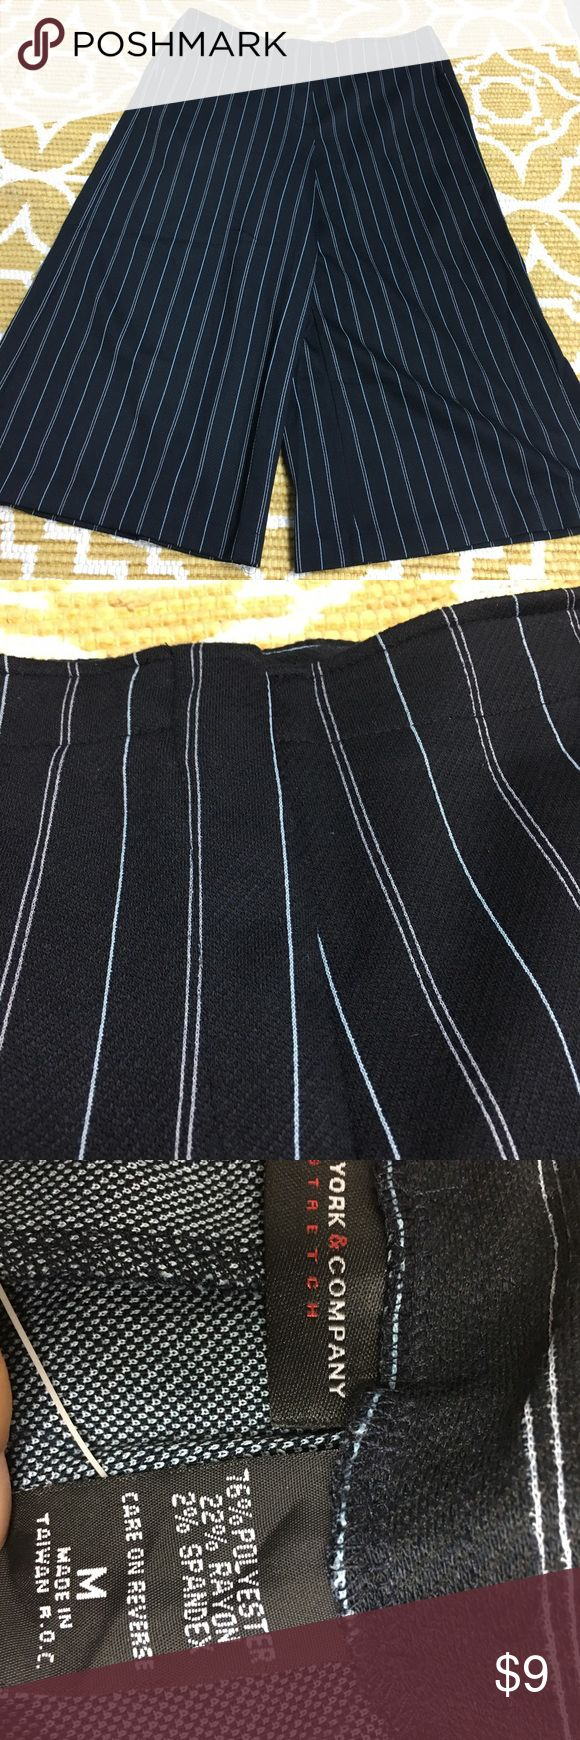 NWOT Med Wide Leg NY&C Capri Trouser NWOT NAVY Pinstripe Med Wide Leg NY&C Capri Trouser New York & Company Pants Capris